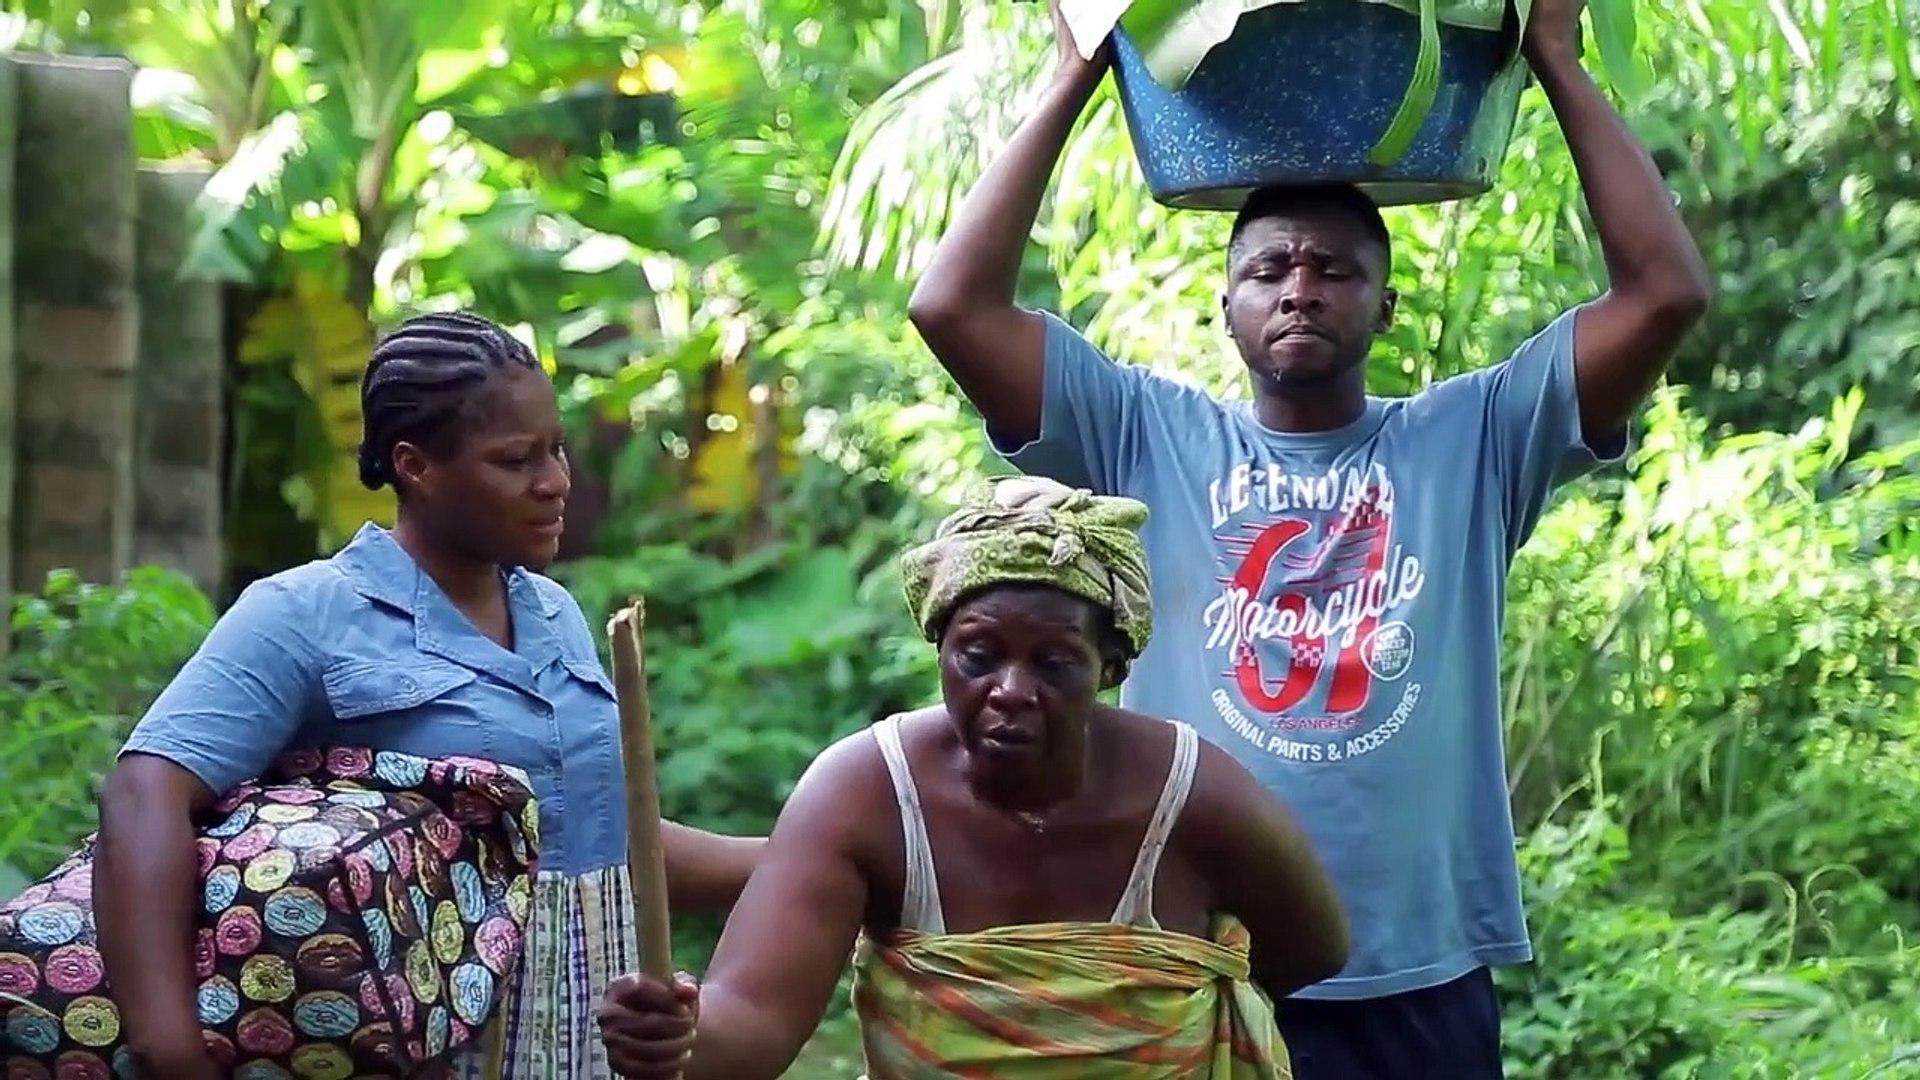 HOW MY HUSBAND'S BROTHERS TURNED ME MAD{MAD WIDOWS 5}-NIGERIAN MOVIES 2019